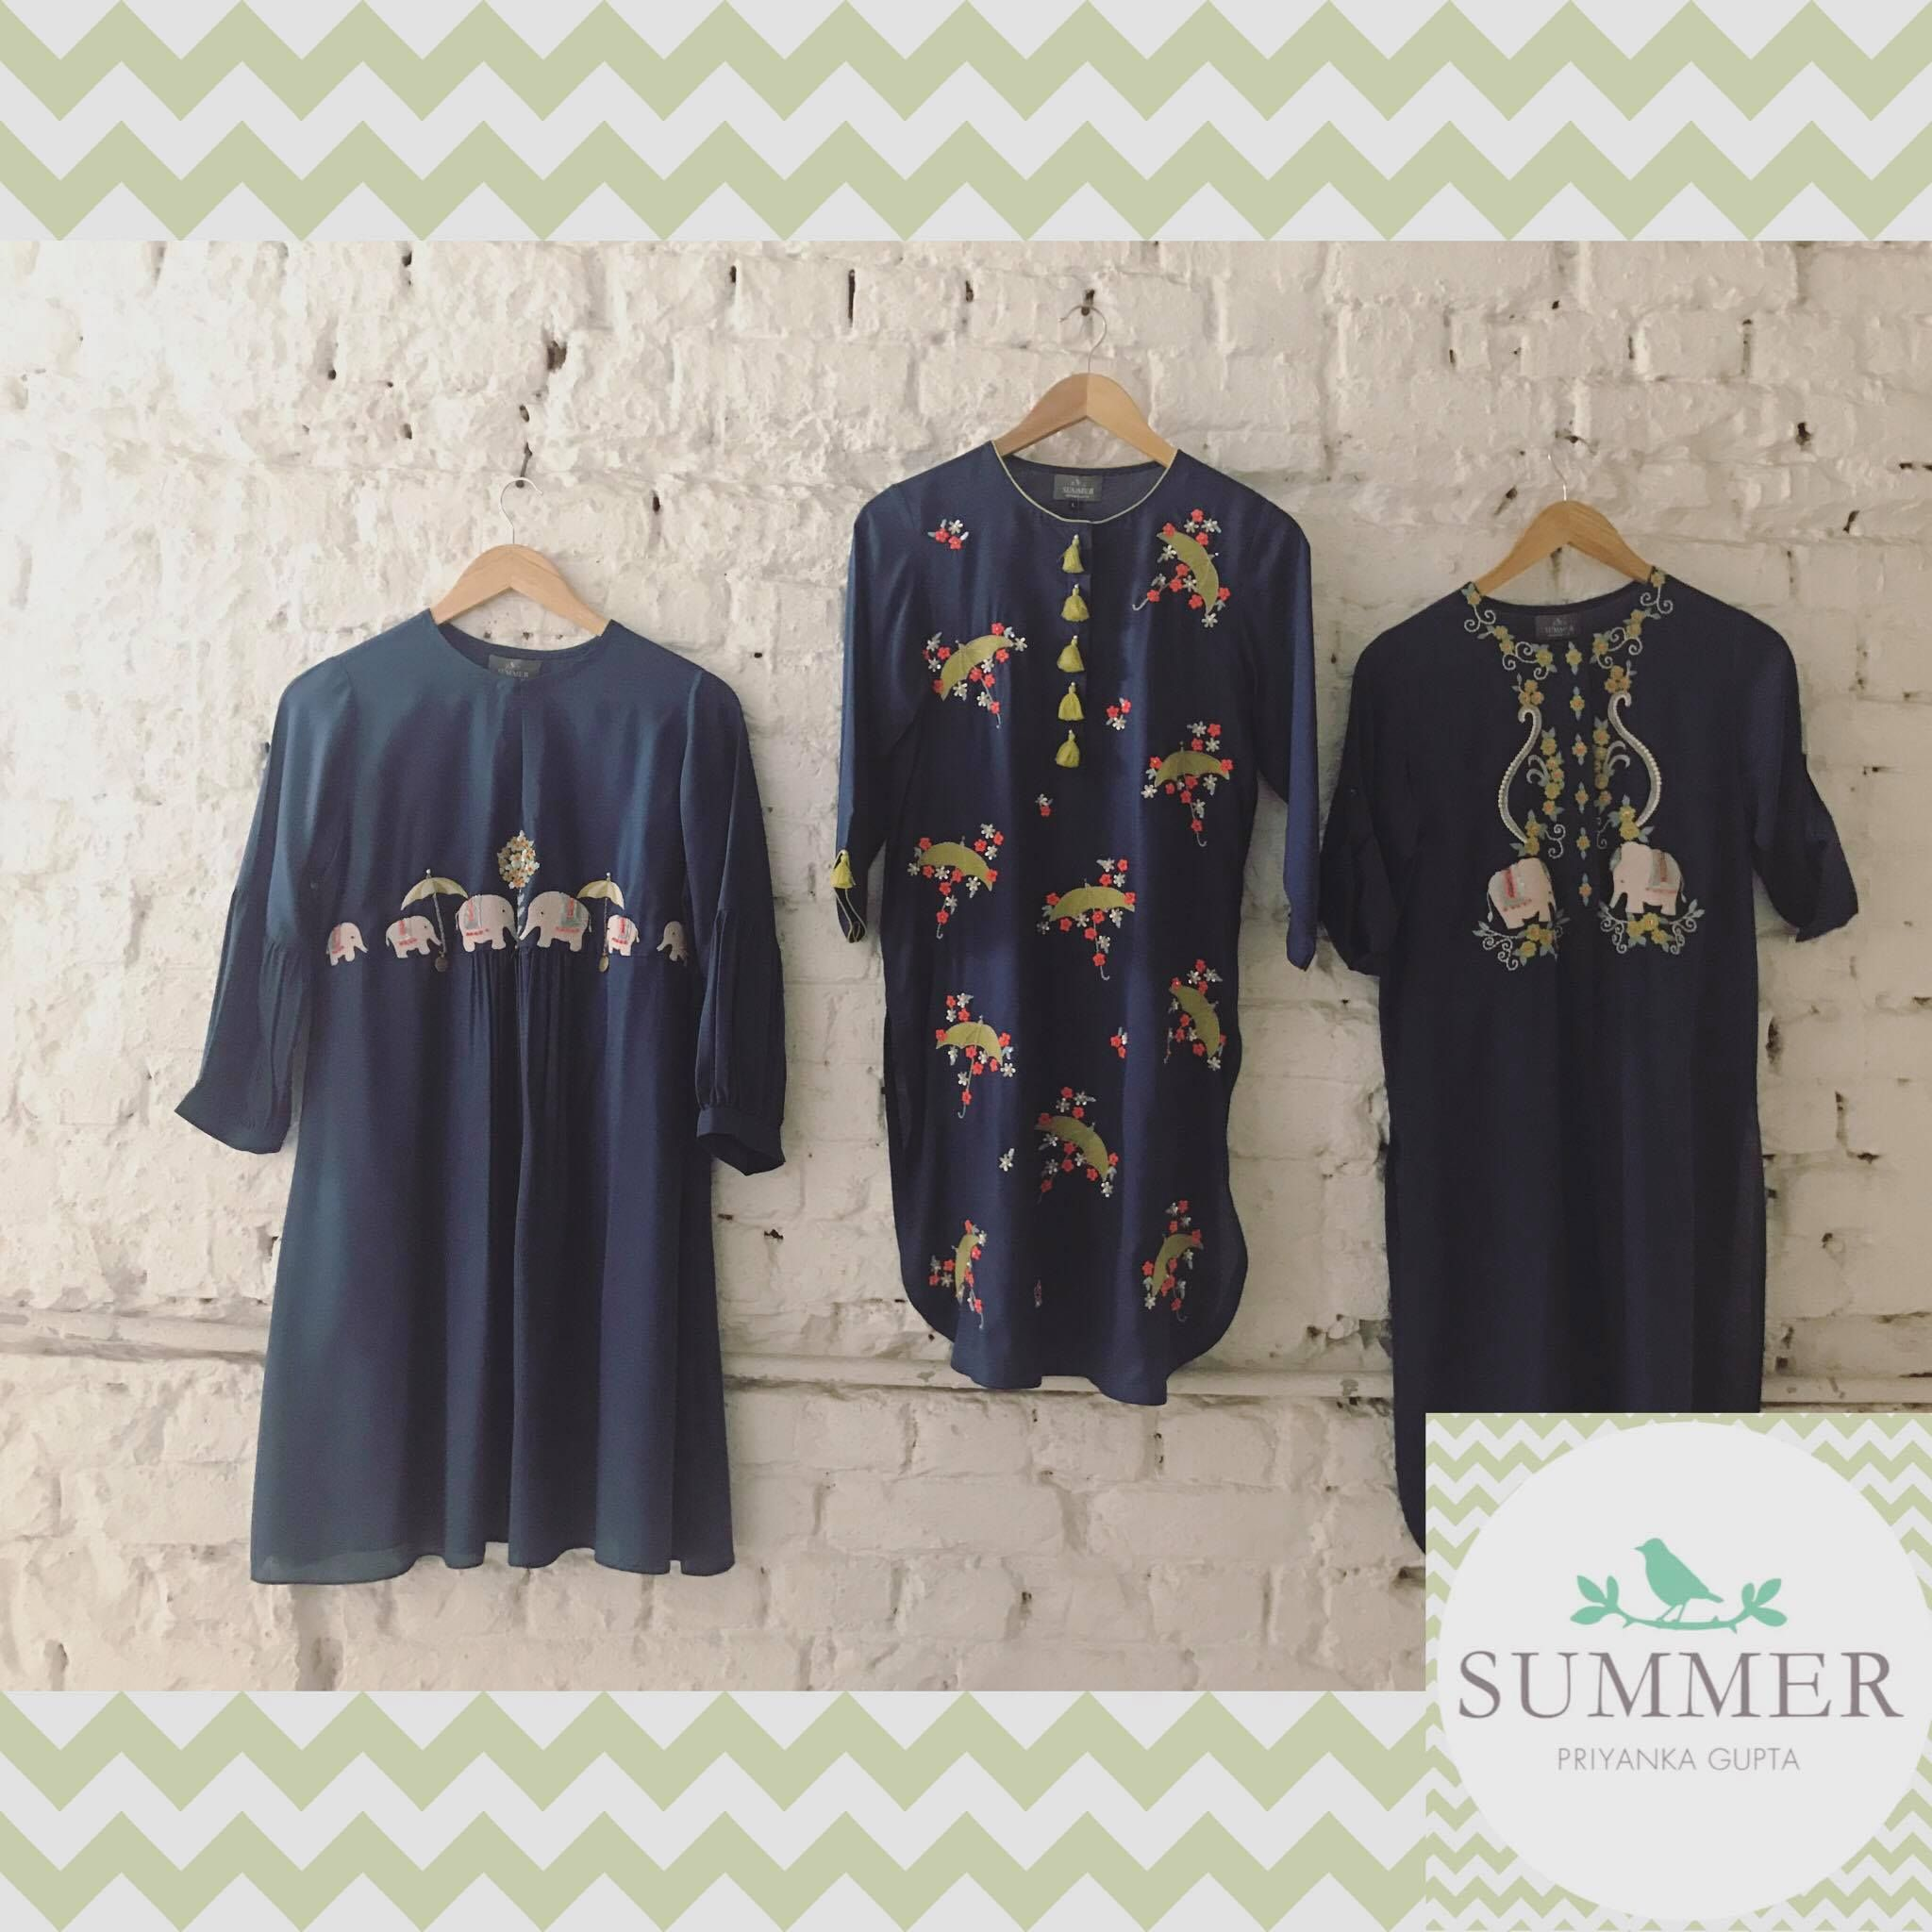 Dark Blue Tunics from summer by priynaka gupta.